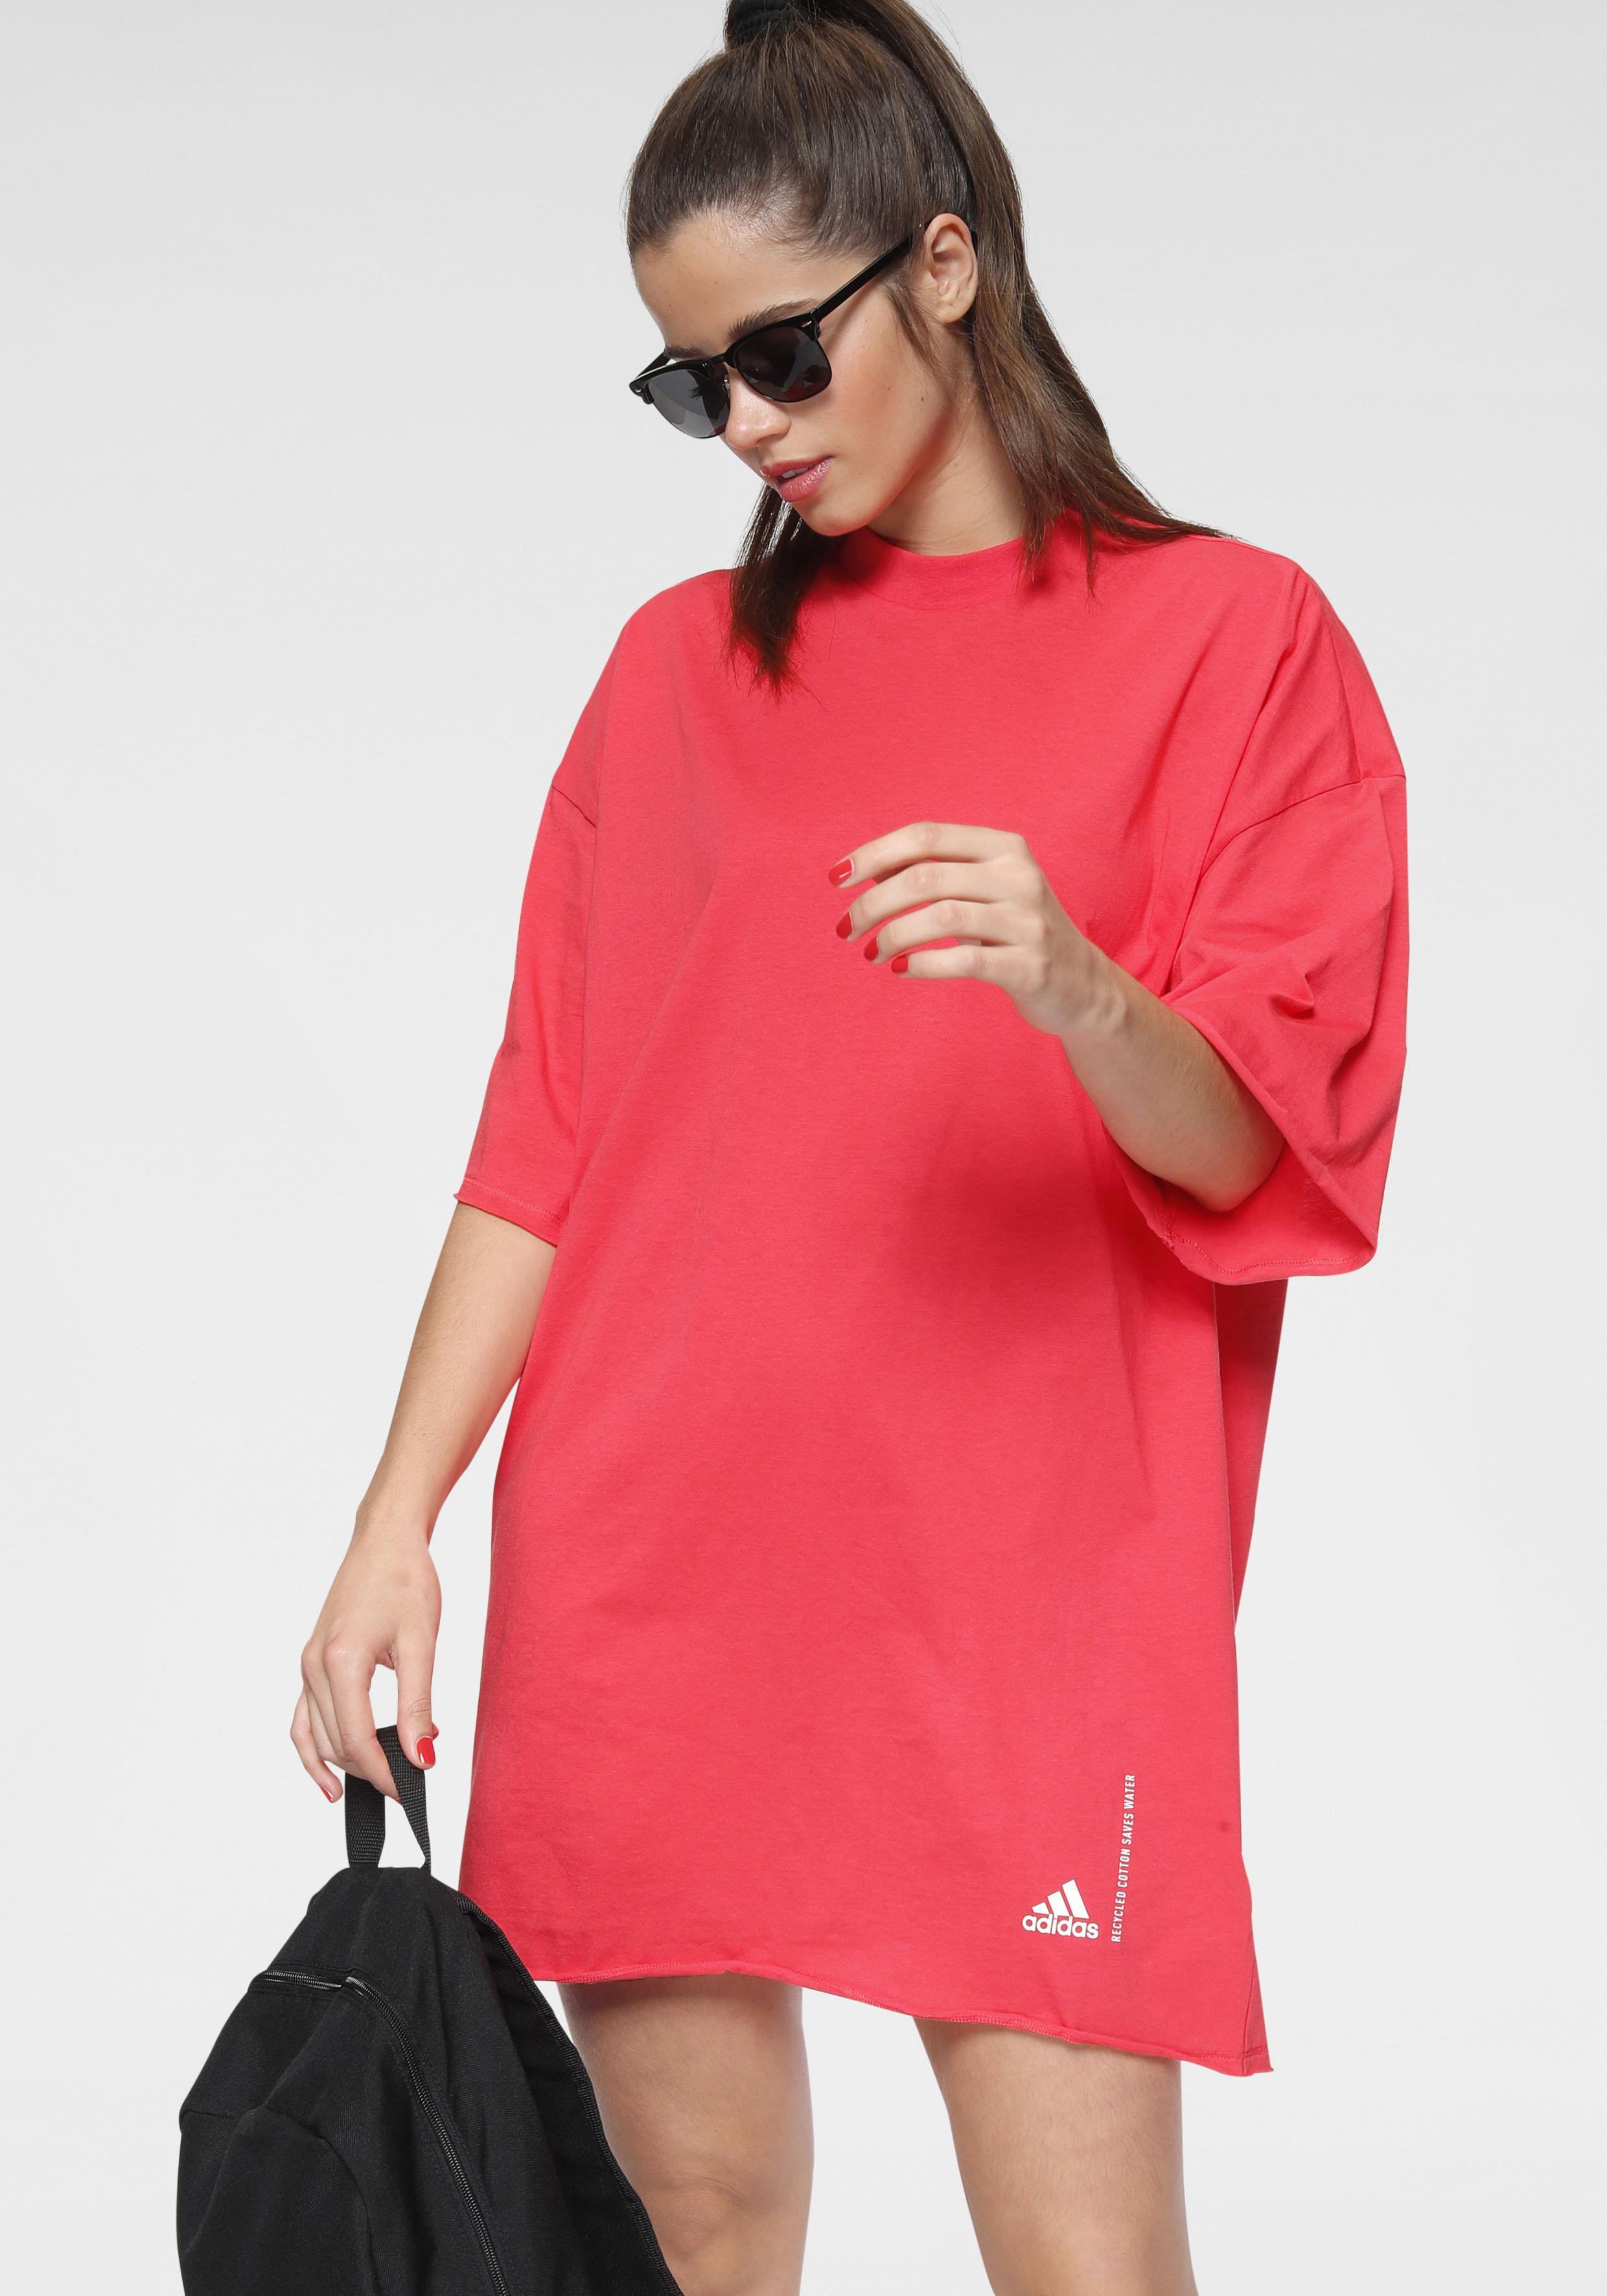 adidas performance -  Shirtkleid RECYCLE COTTON TEE